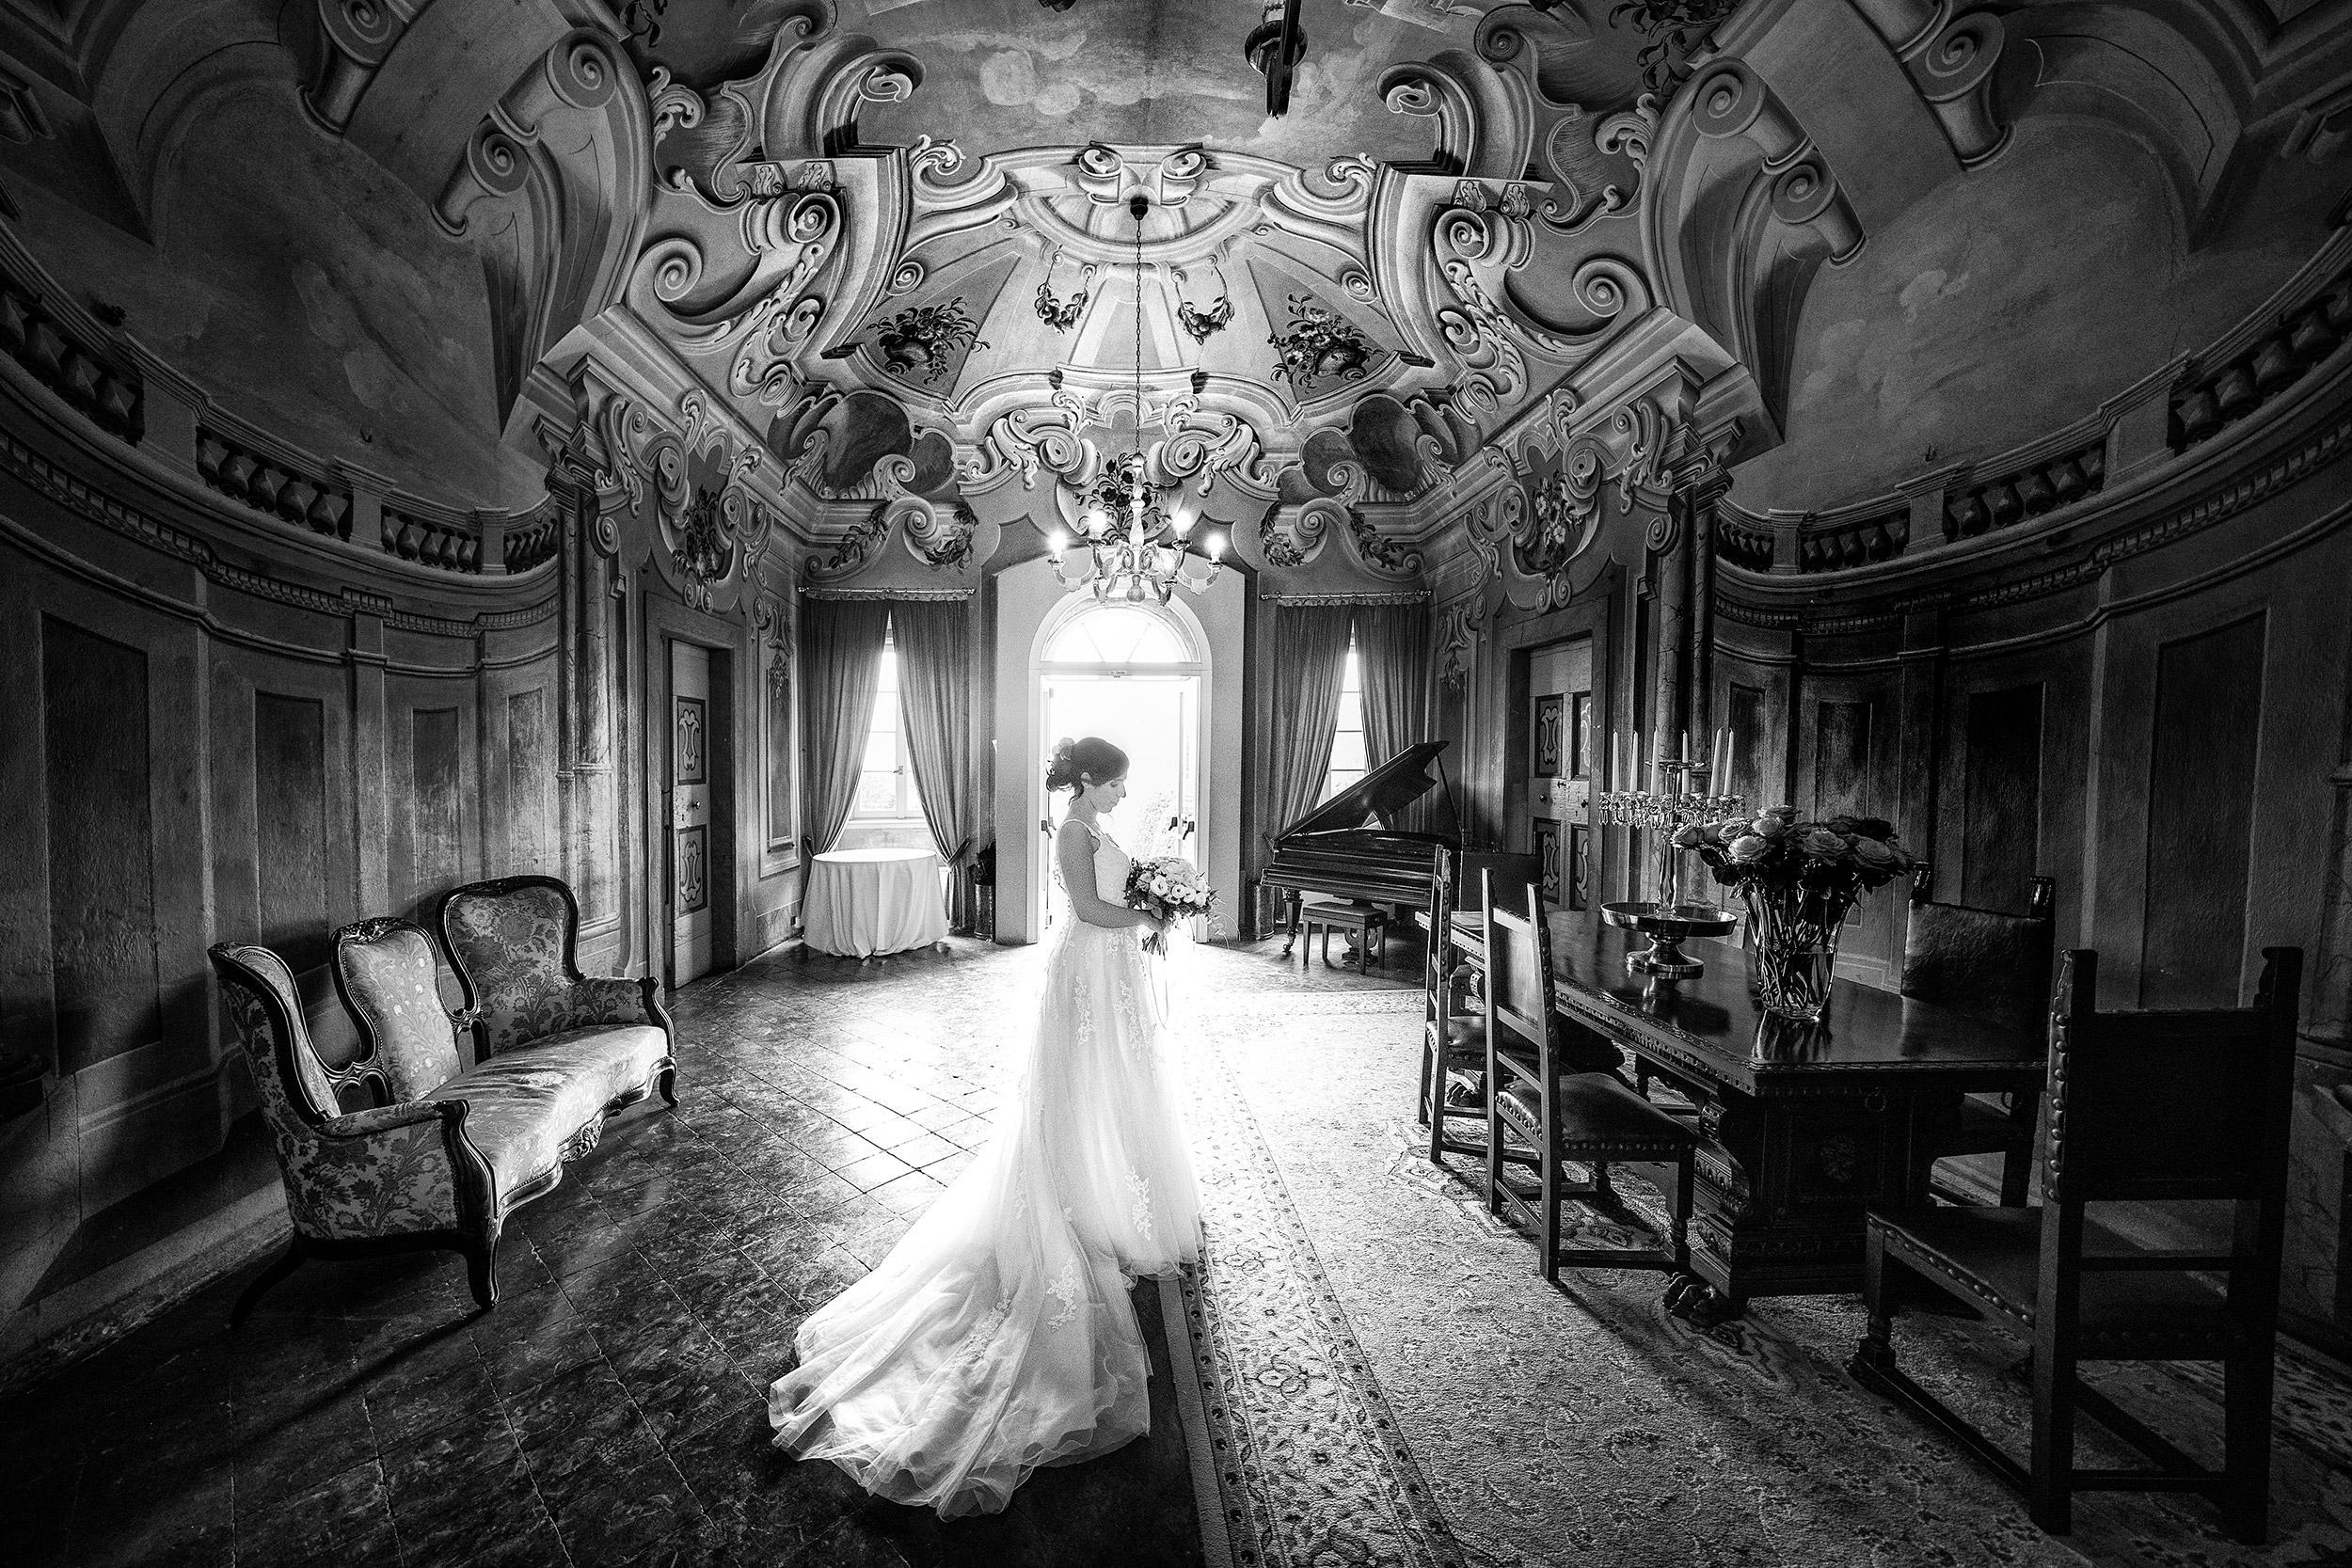 000 reportage wedding matrimonio sposi foto villa canton bergamo 1